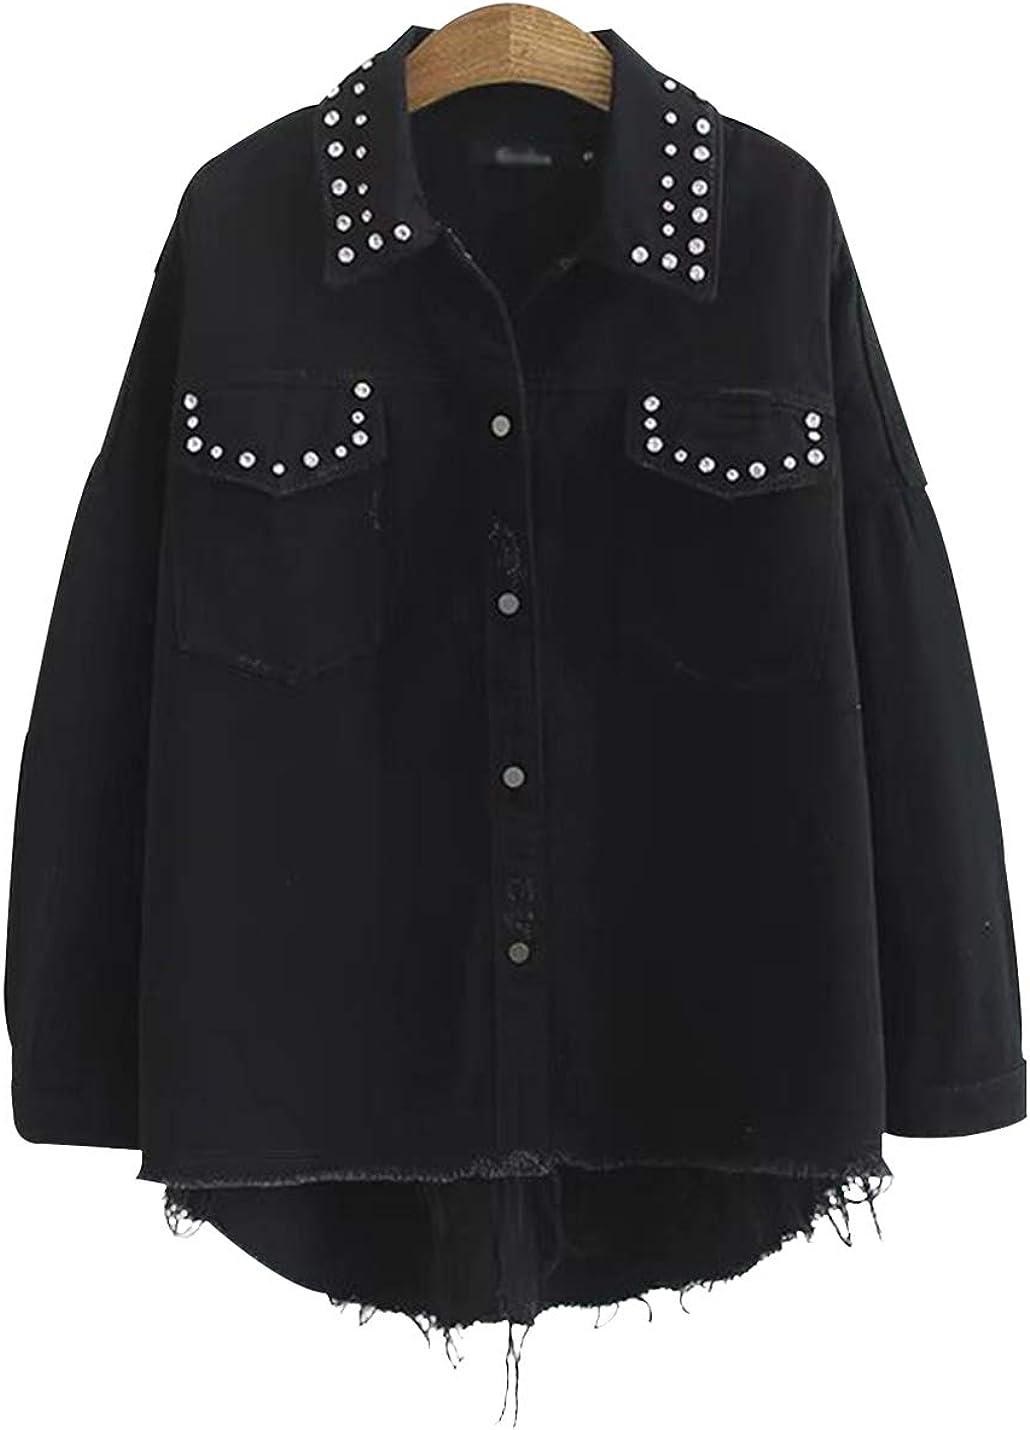 Gihuo Women's Vintage Oversized Button Down Black Jean Denim Jackets